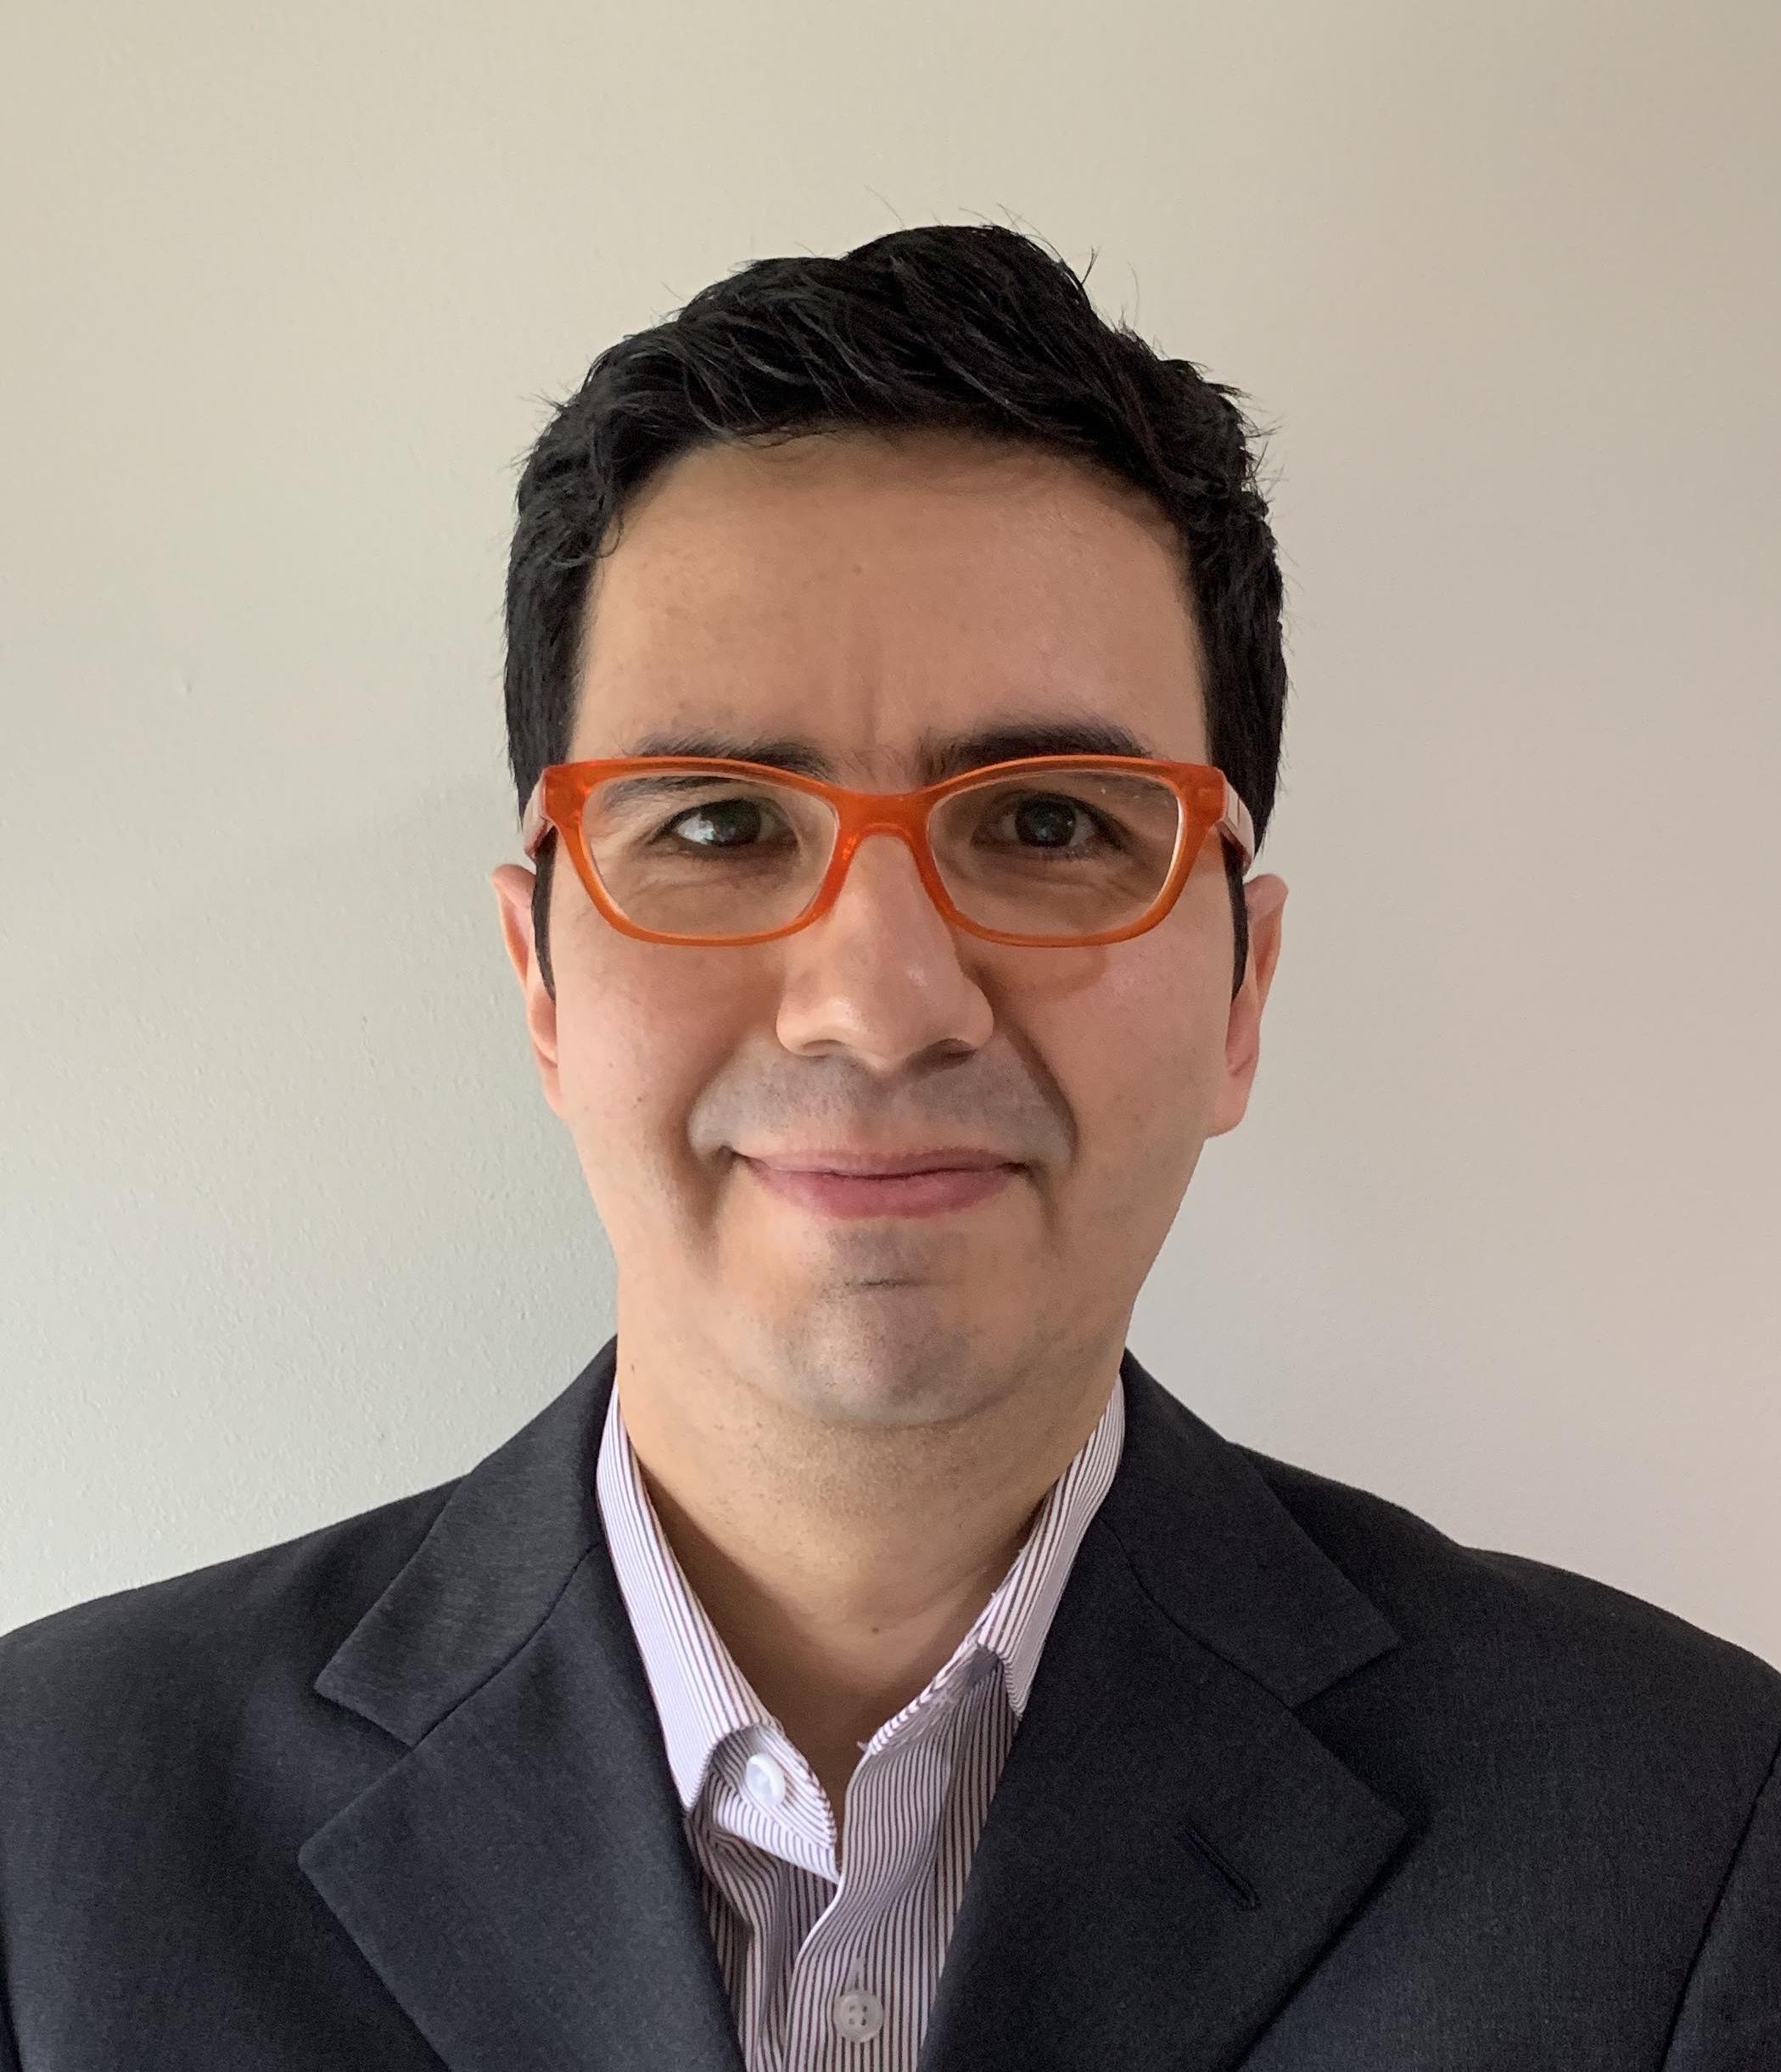 Mario Valadez Trevino